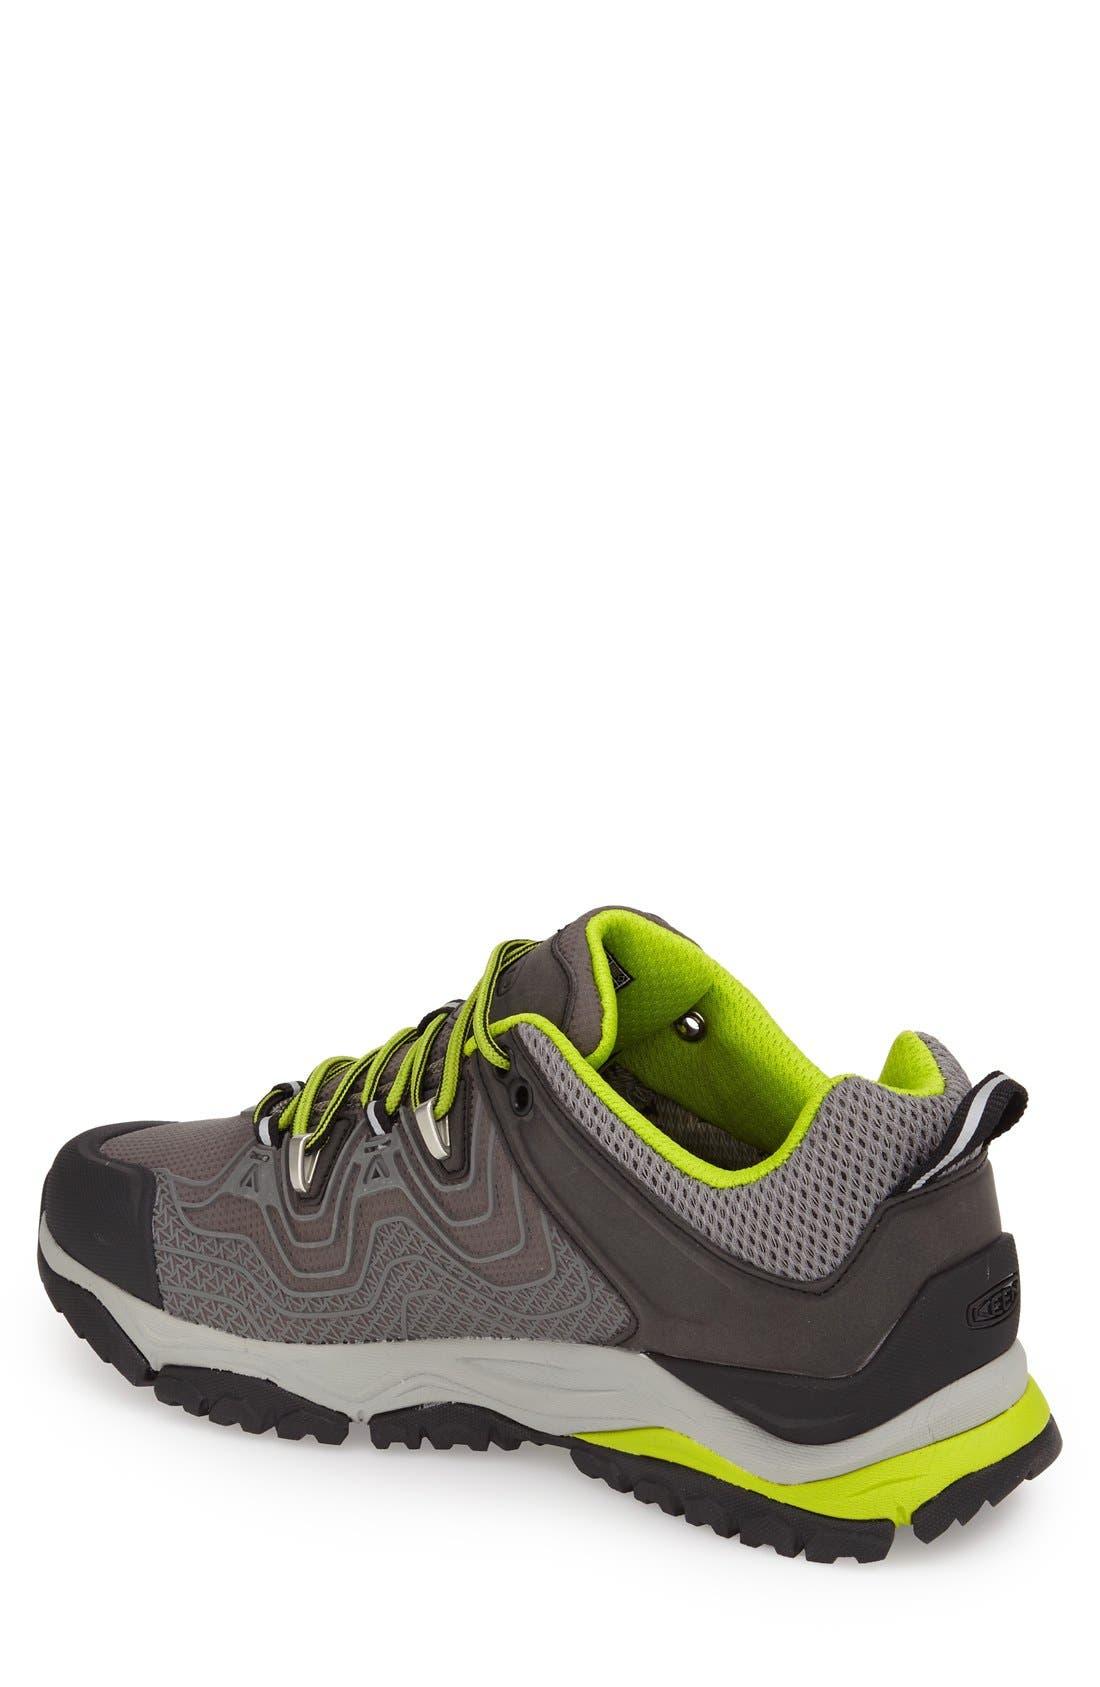 Alternate Image 2  - Keen 'Aphlex' Waterproof Low Profile Hiking Shoe (Men)